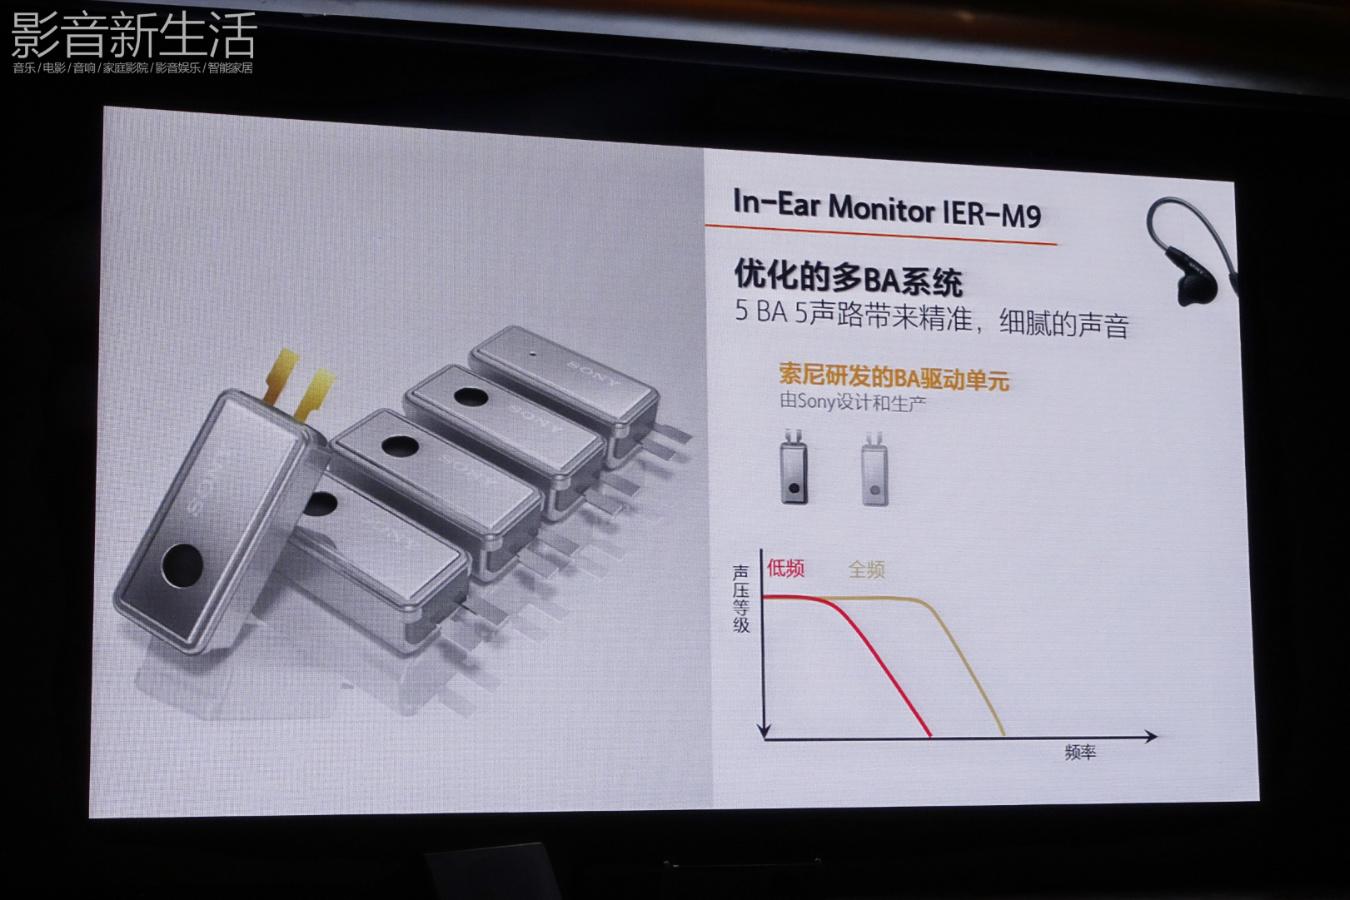 "Sony Hi Res 2018 19 - 新品 | ""重塑随身音乐娱乐王朝!"":Sony索尼发布Signature醇音系列新兄弟IER-Z1R和DMP-Z1,以及舞台监听耳机系列:IER-M7和IER-M9,还有升级款MDR-Z7M2!"